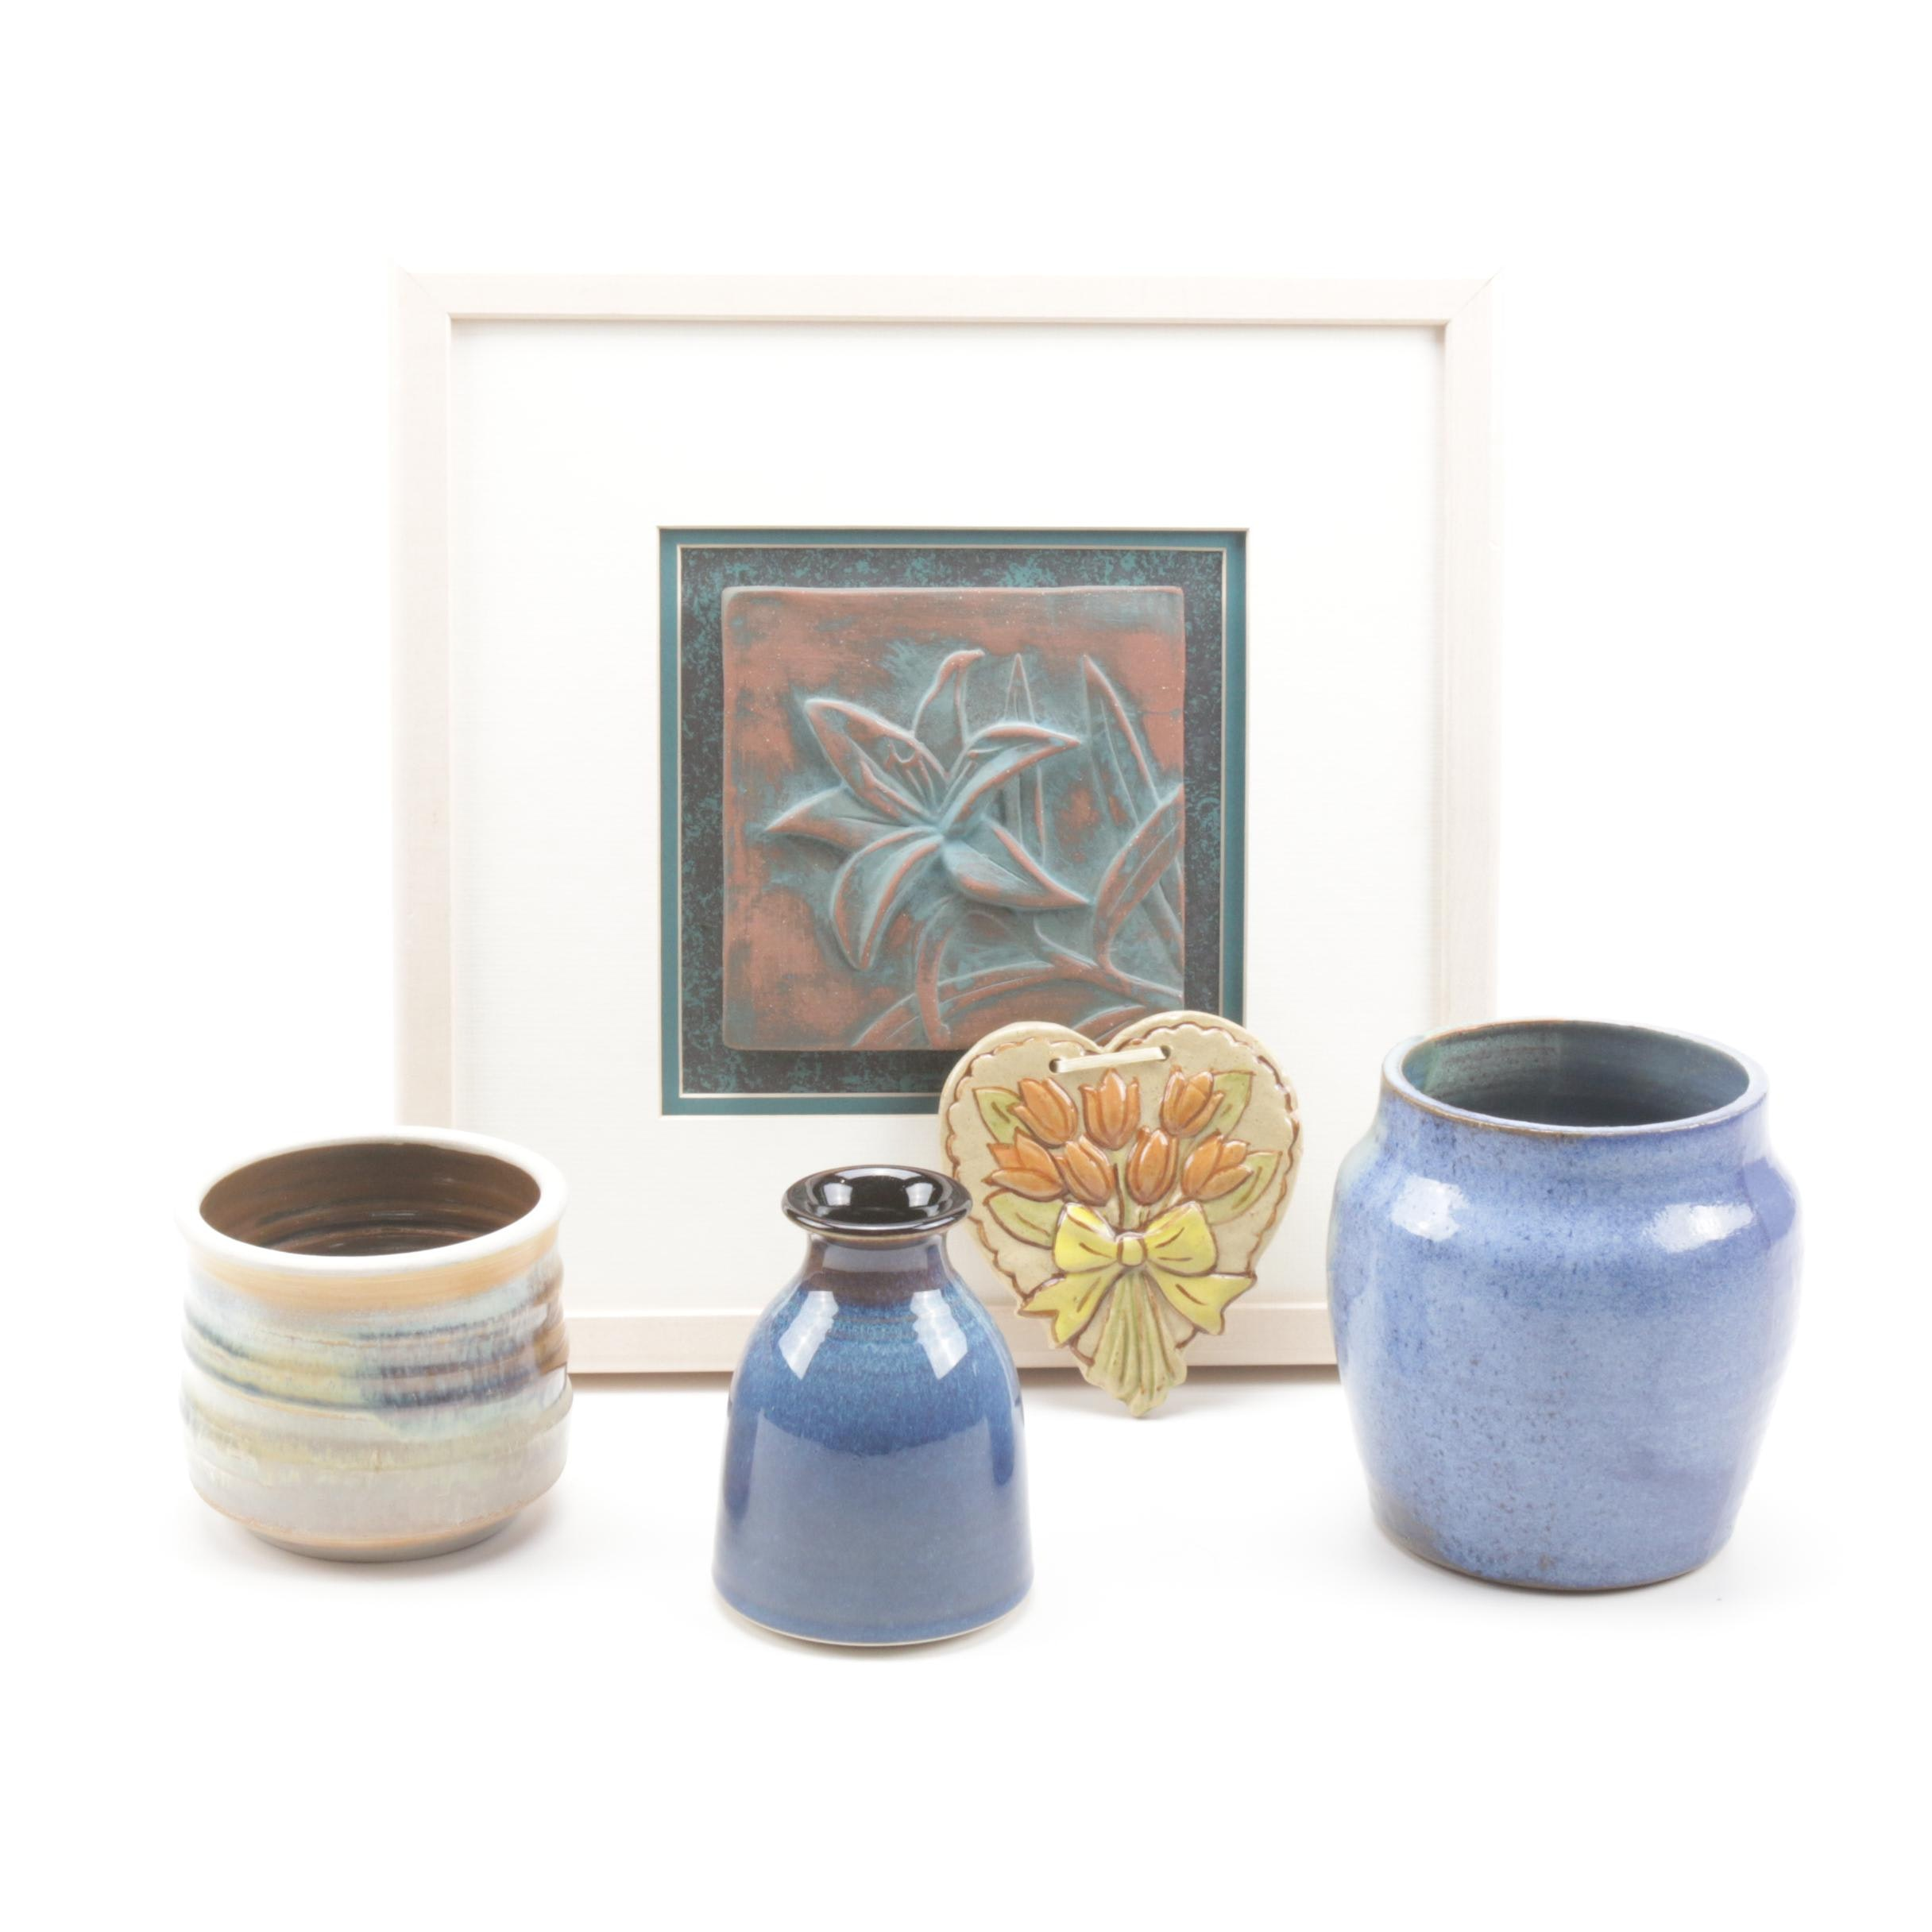 Artisan Pottery Featuring Allan Nairn Tile